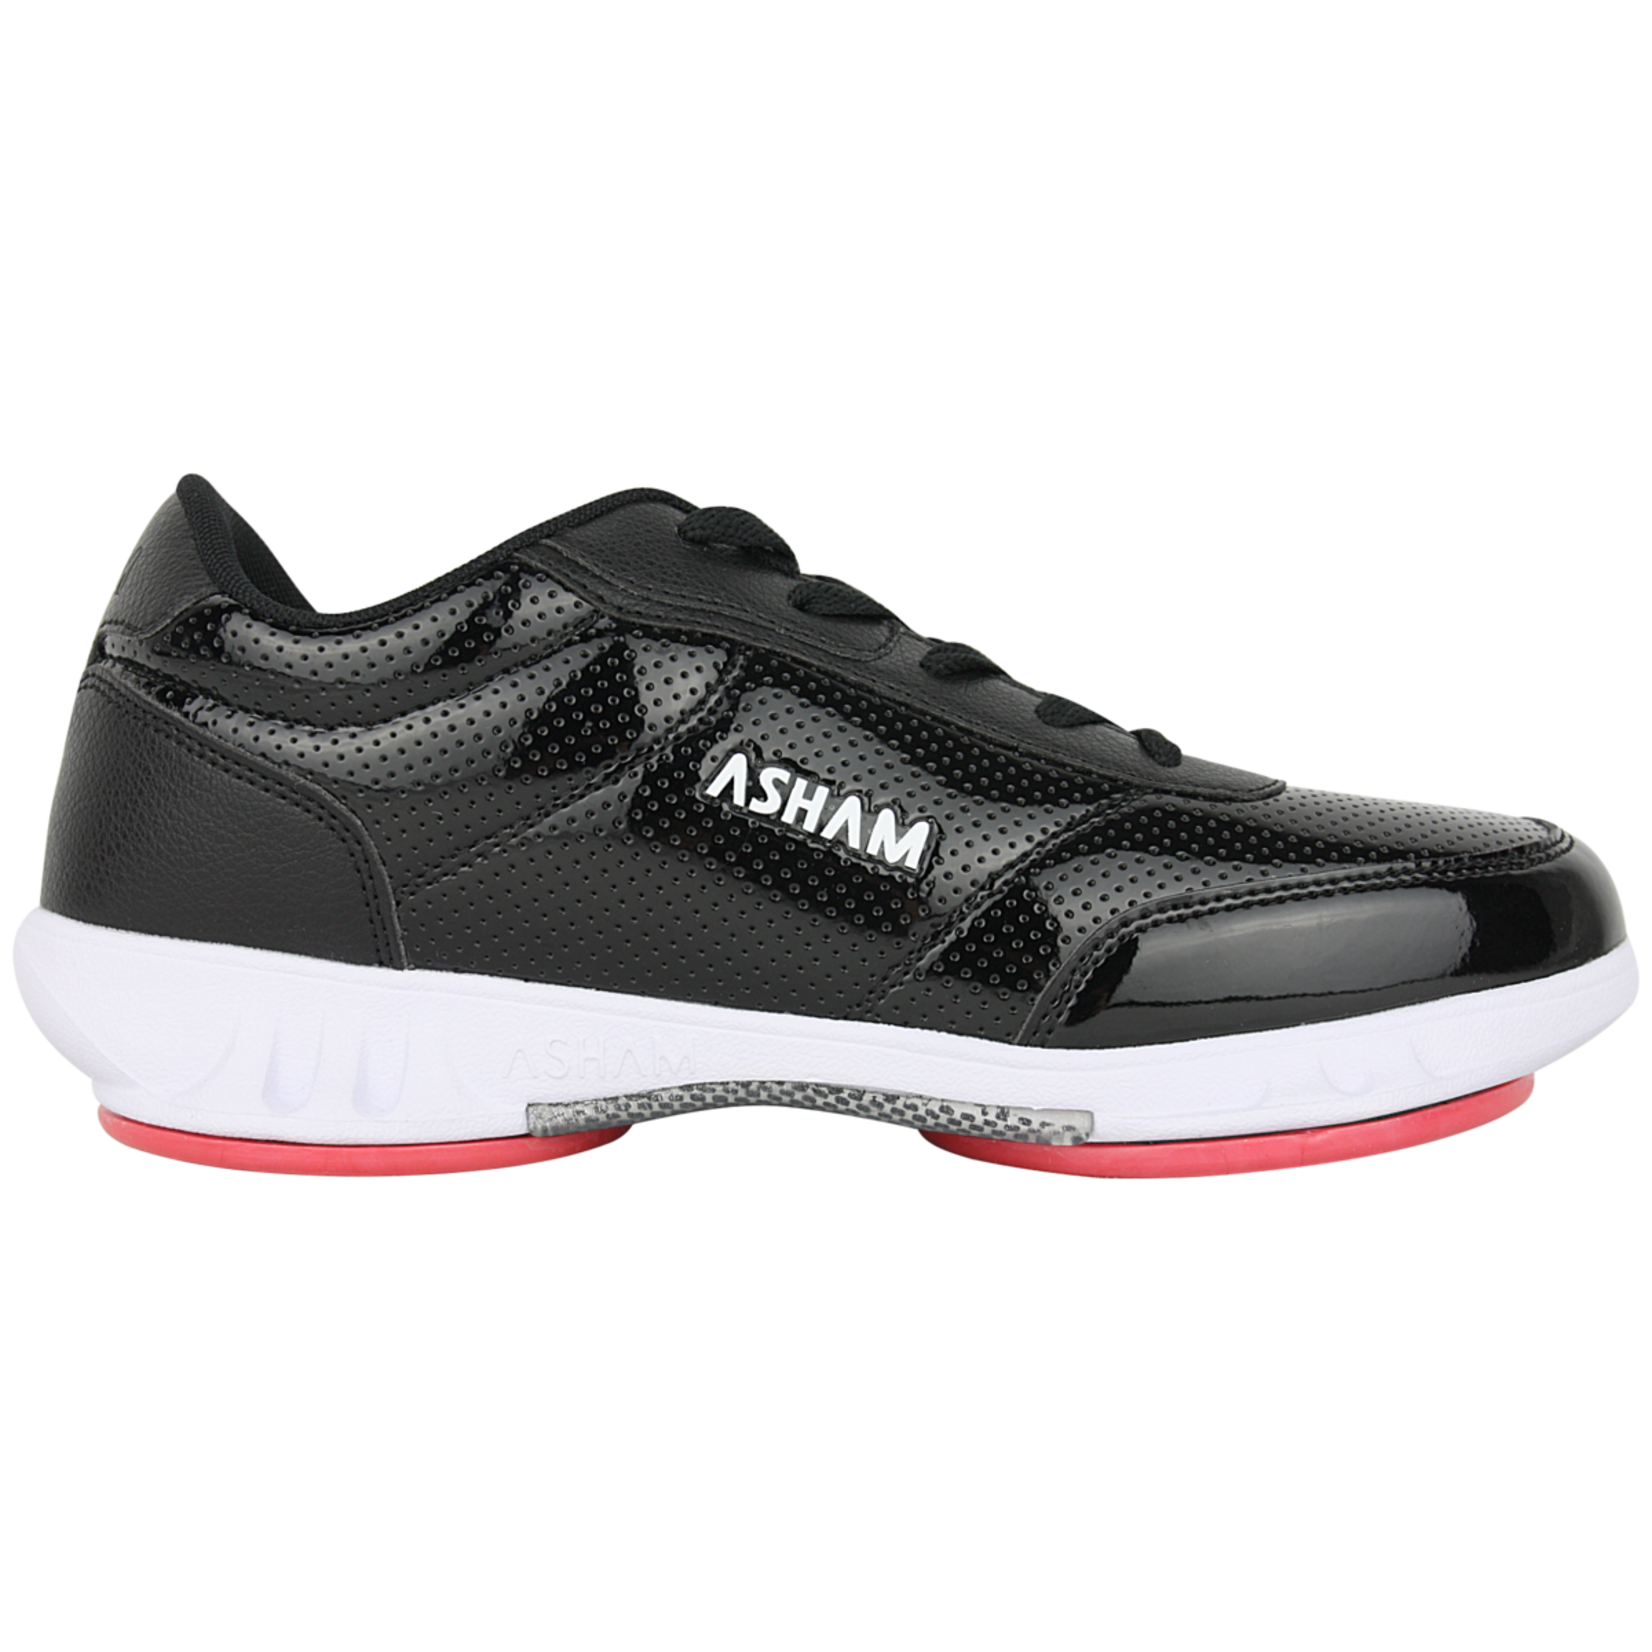 Asham Asham Curling Shoes, Ace Ultra Lite Rotator, Mens